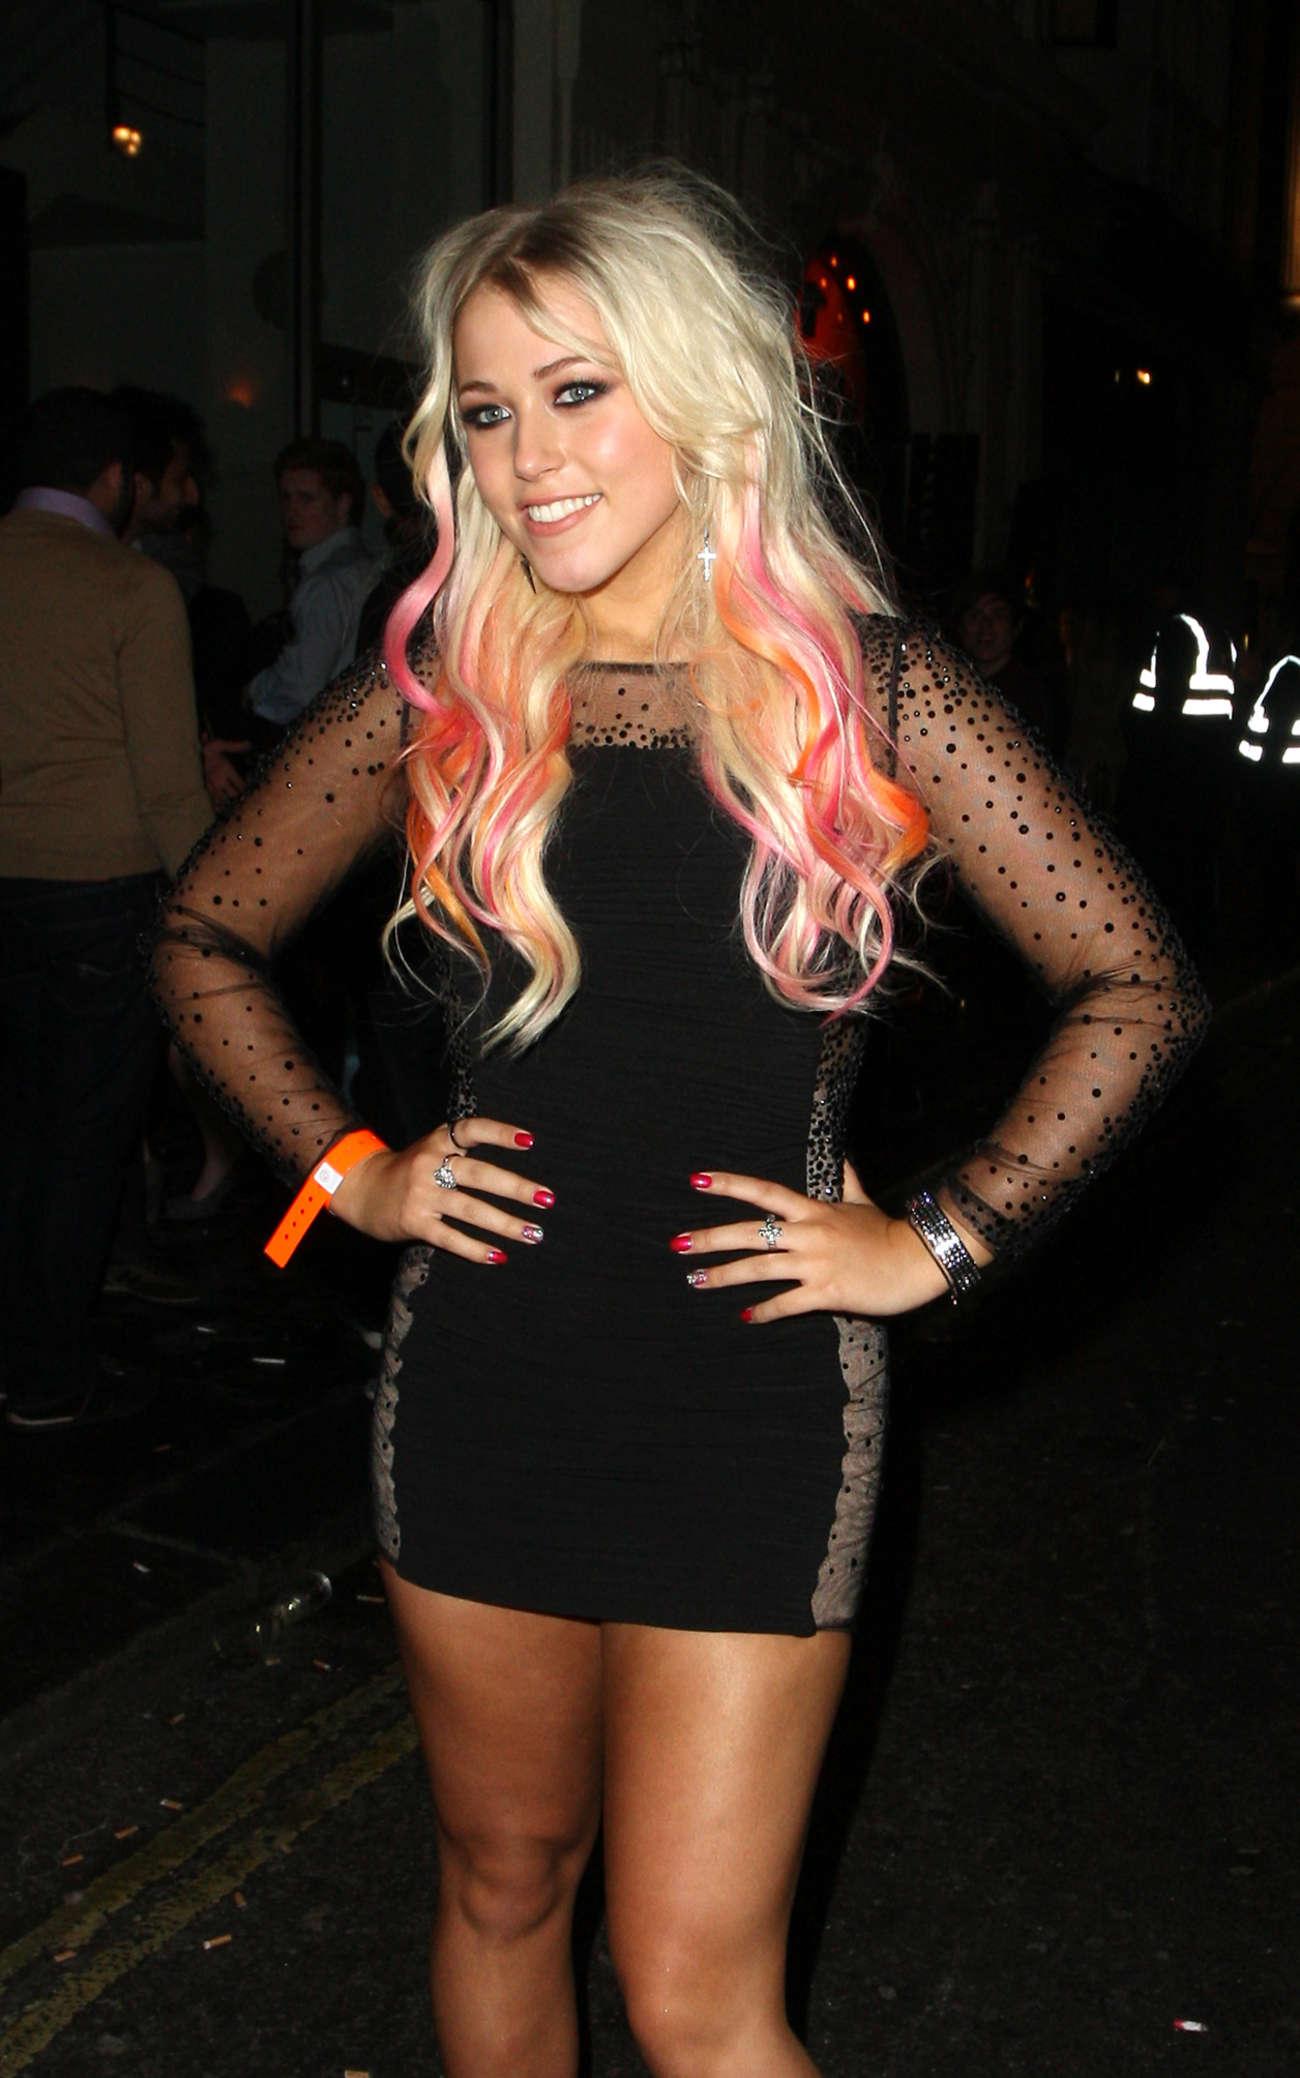 Amelia Lily at Mahiki nightclub in London-06 - Full Size